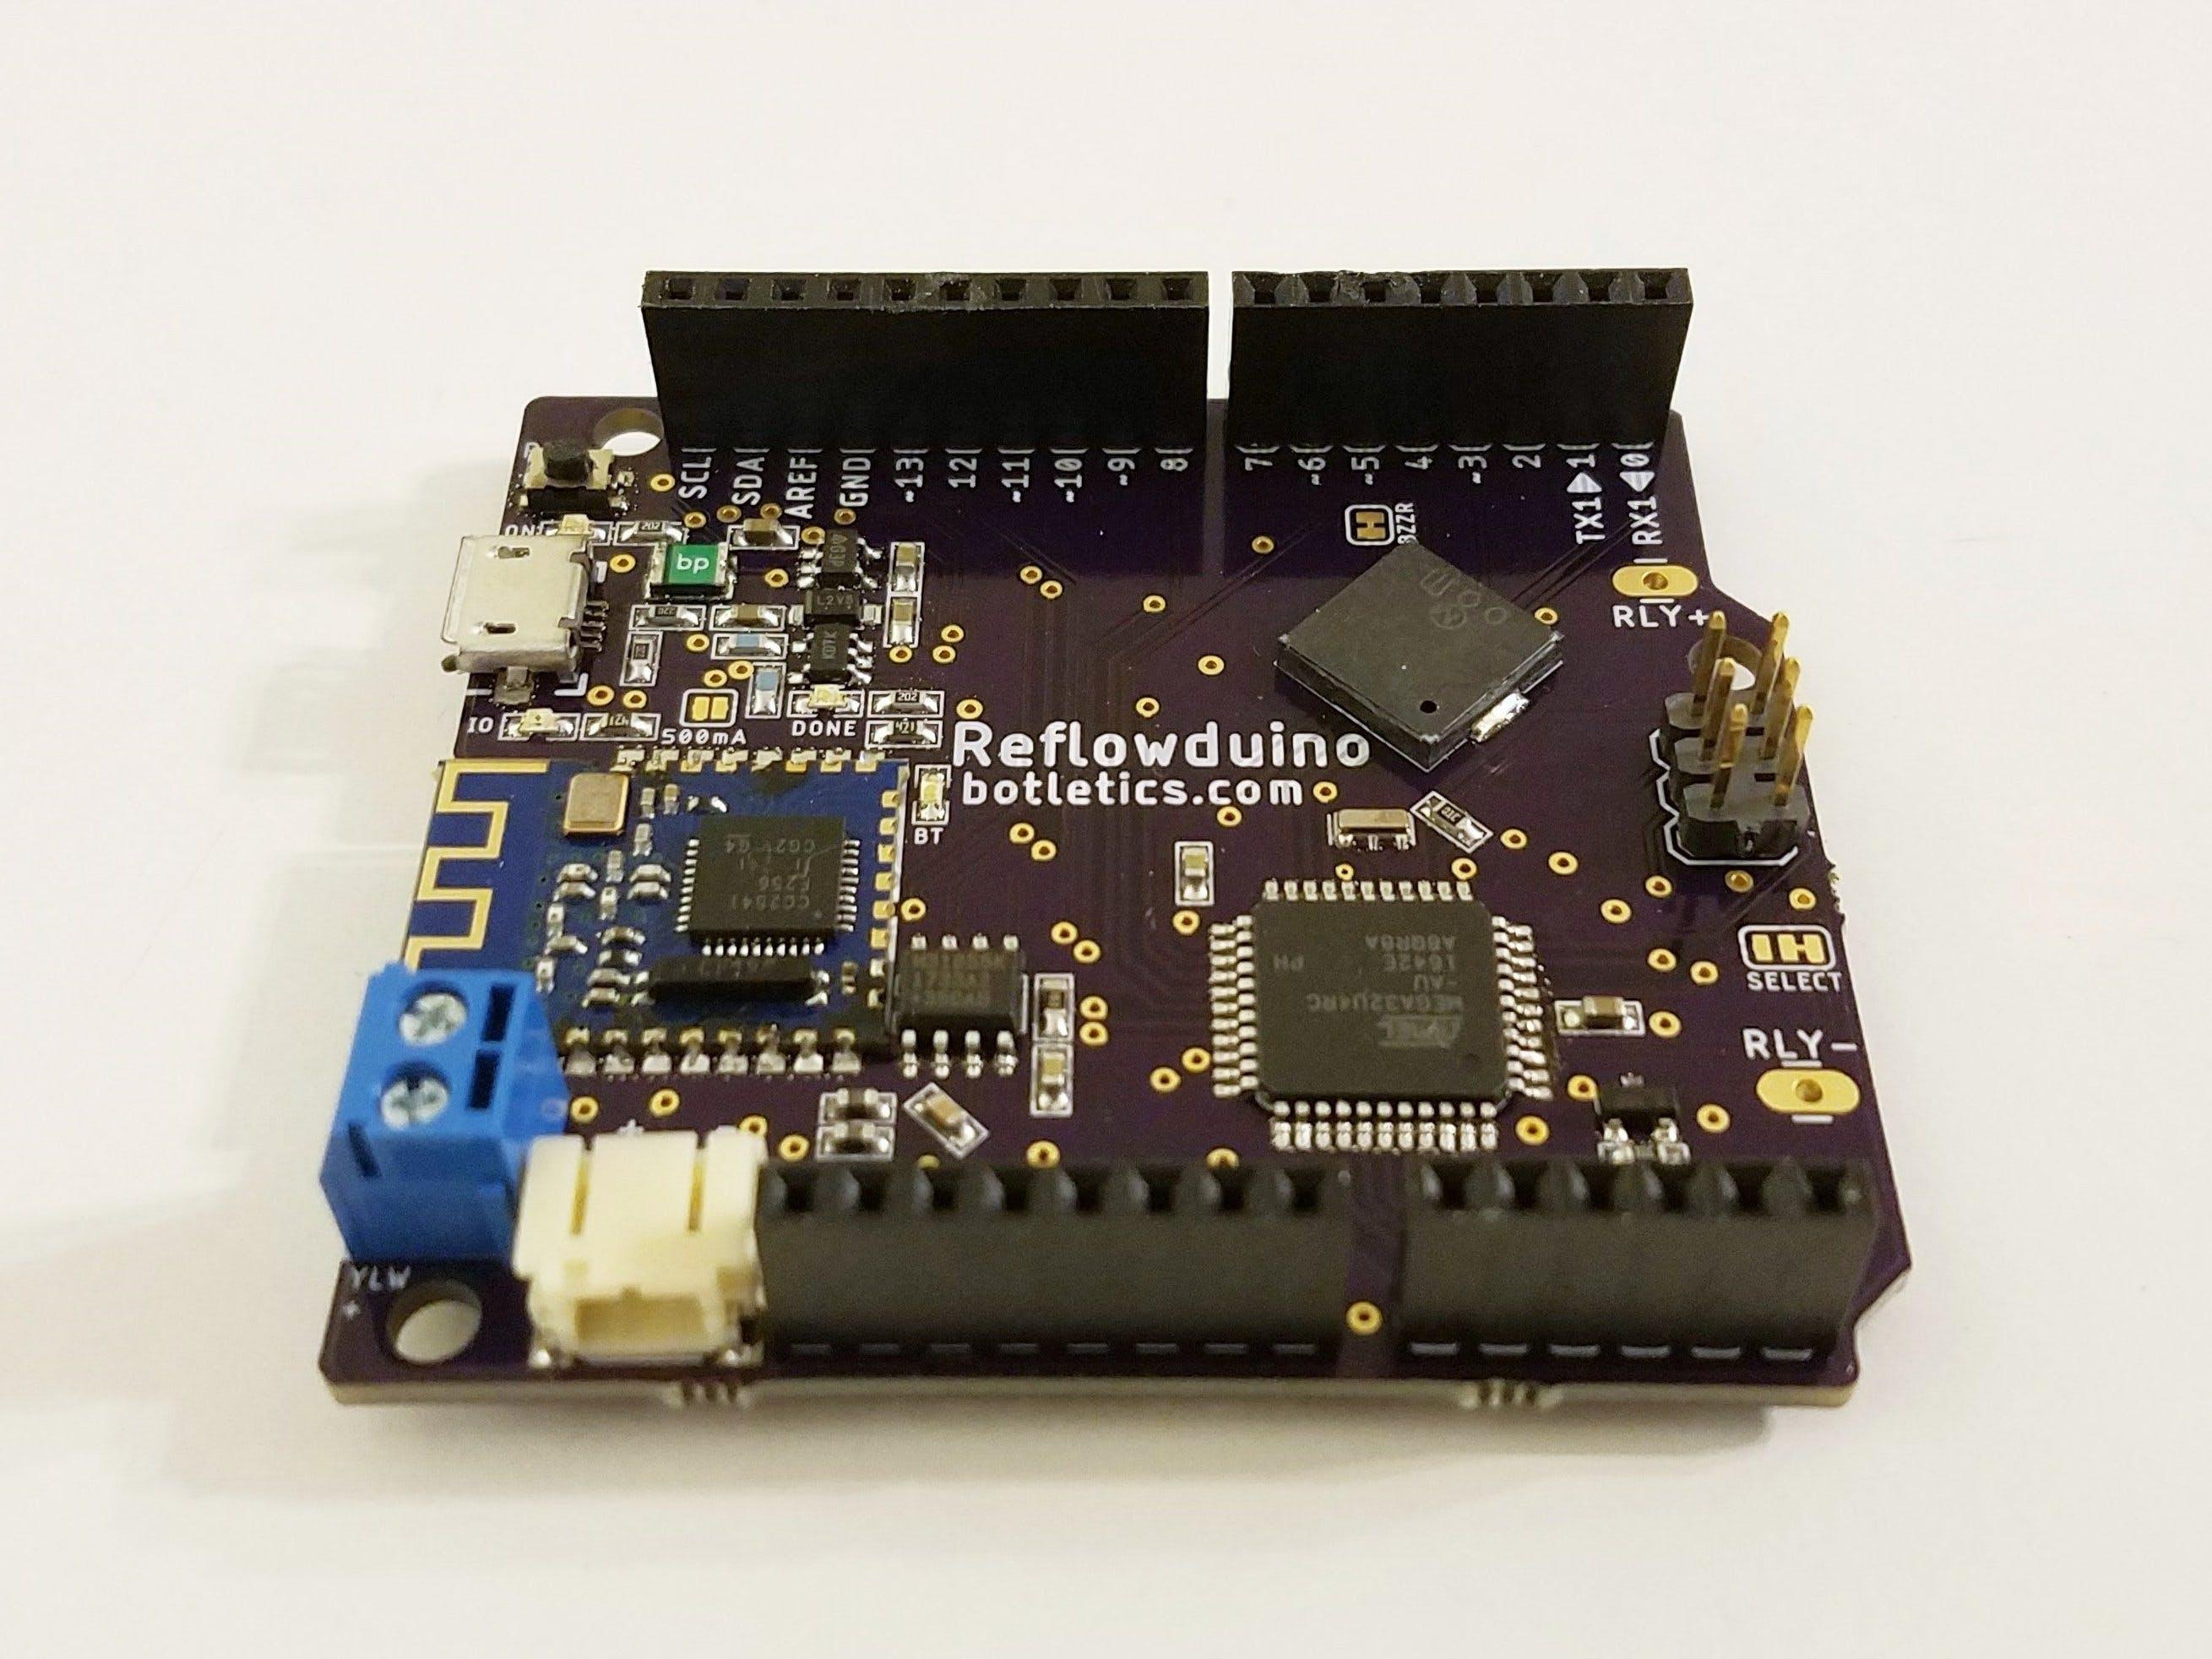 DIY Reflow Oven with Reflowduino